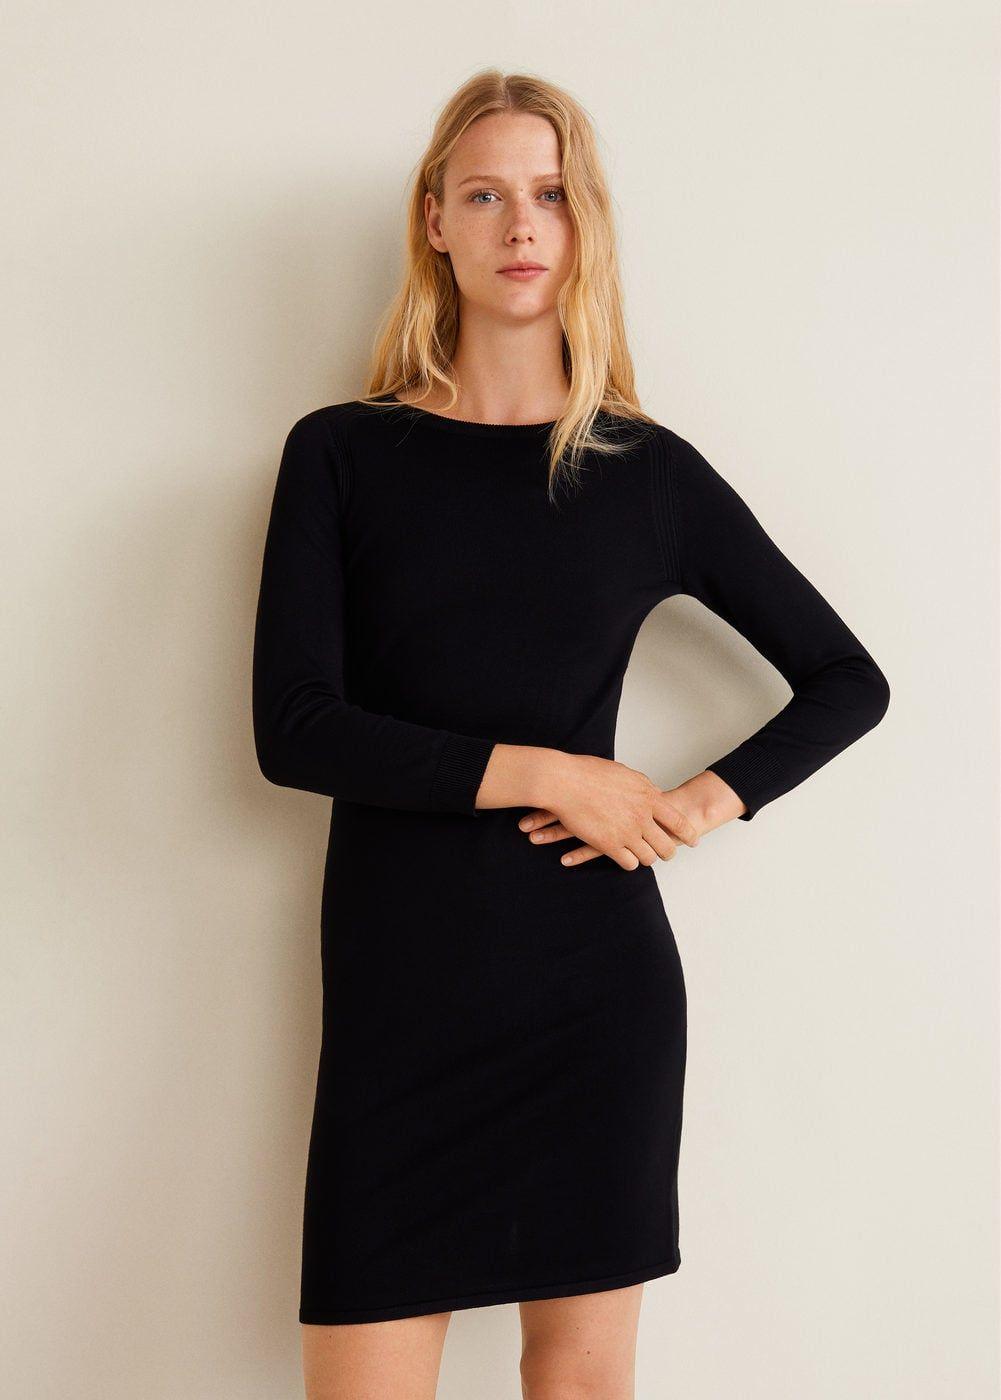 Robe cintrée maille - Femme   Wishlist   Pinterest   Dresses, Knit ... 9683eaa1c125